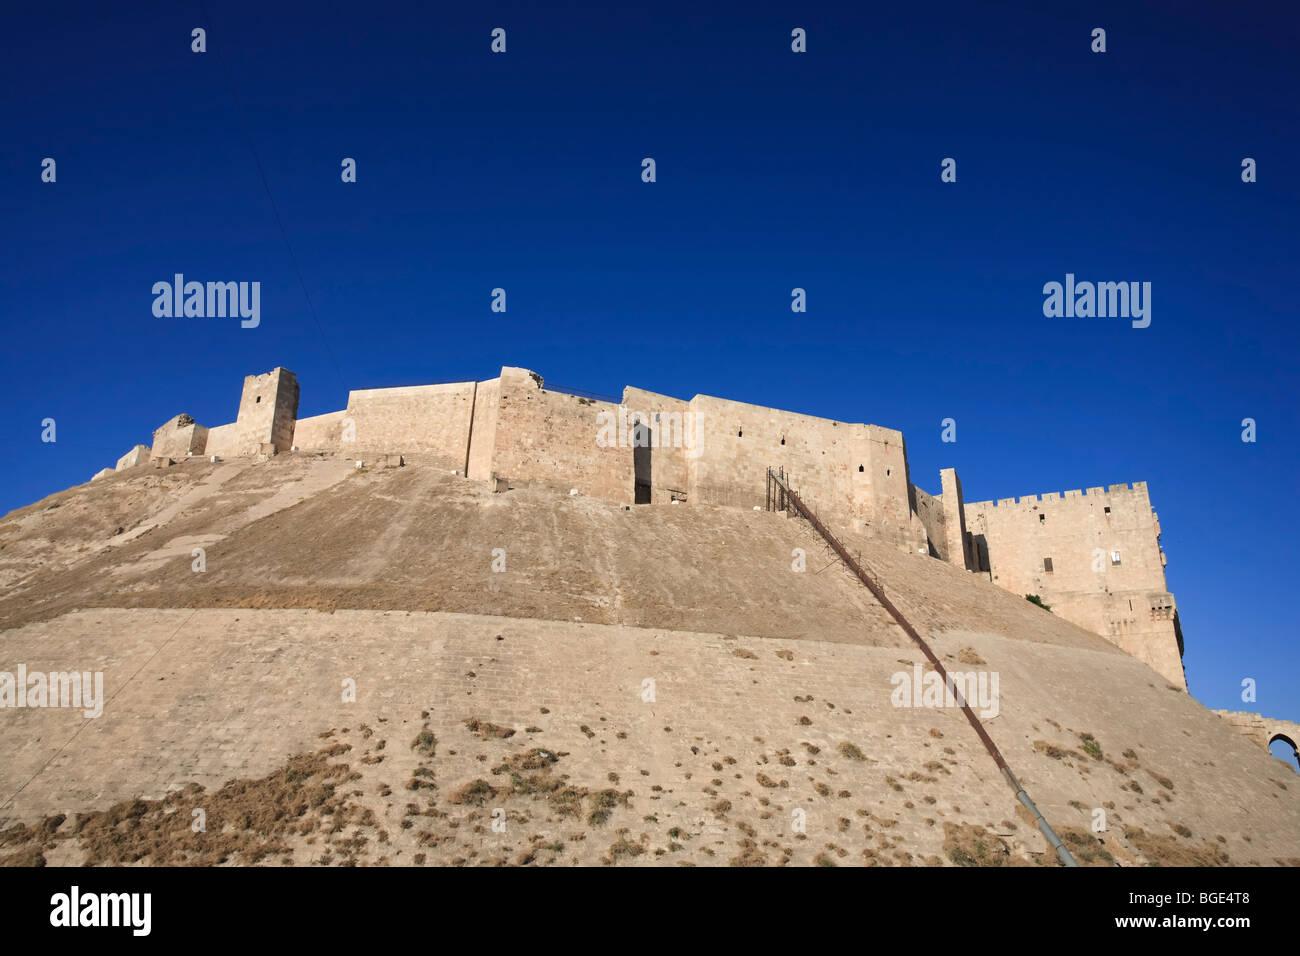 Syria, Aleppo, The Old Town (UNESCO Site), The Citadel Stock Photo